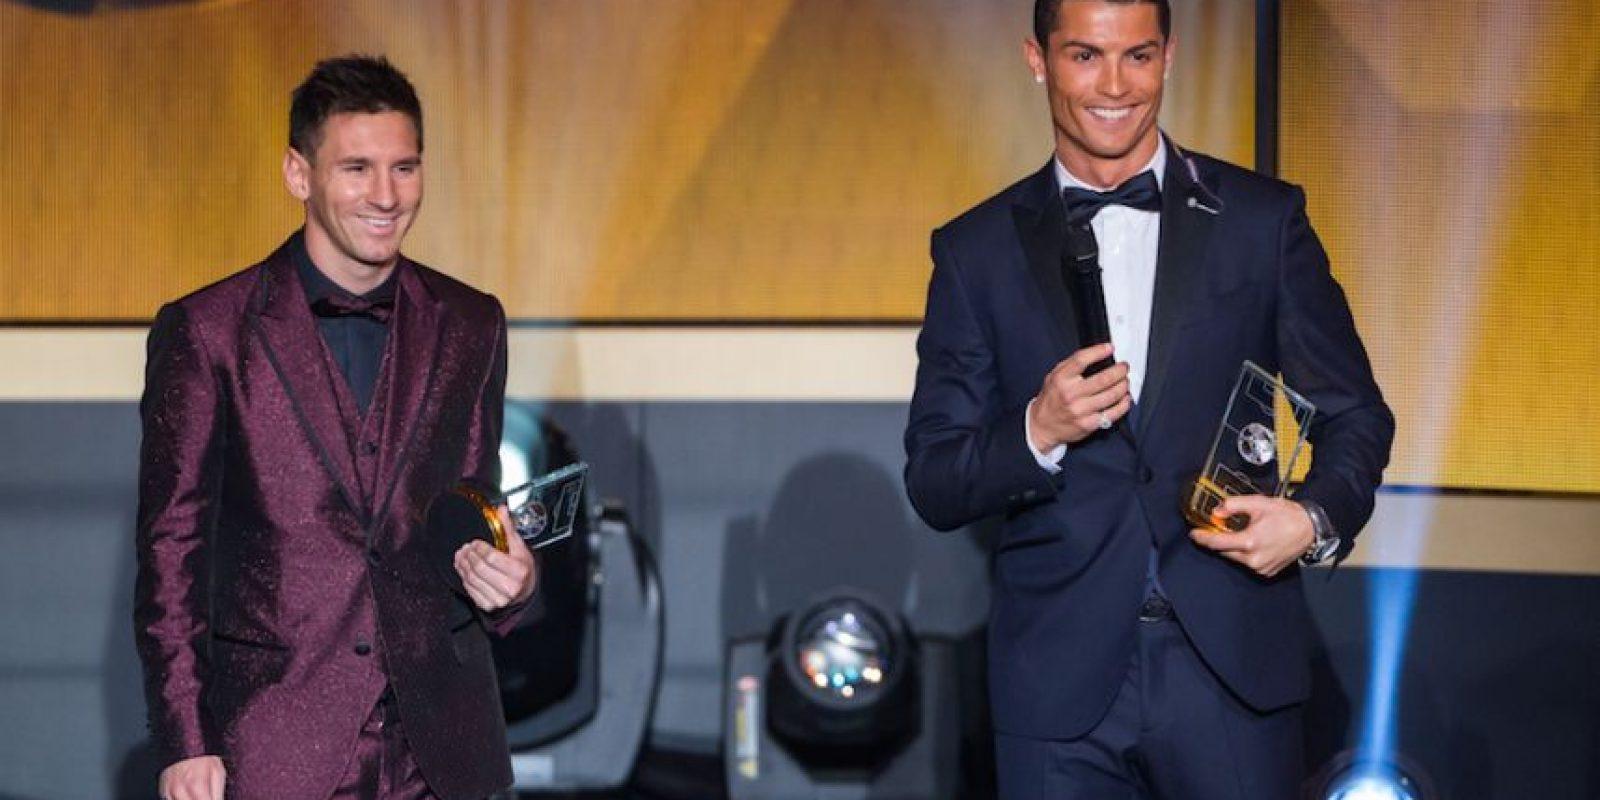 ¿Quién será mejor? ¿Lionel Messi o Cristiano Ronaldo? Foto:Getty Images